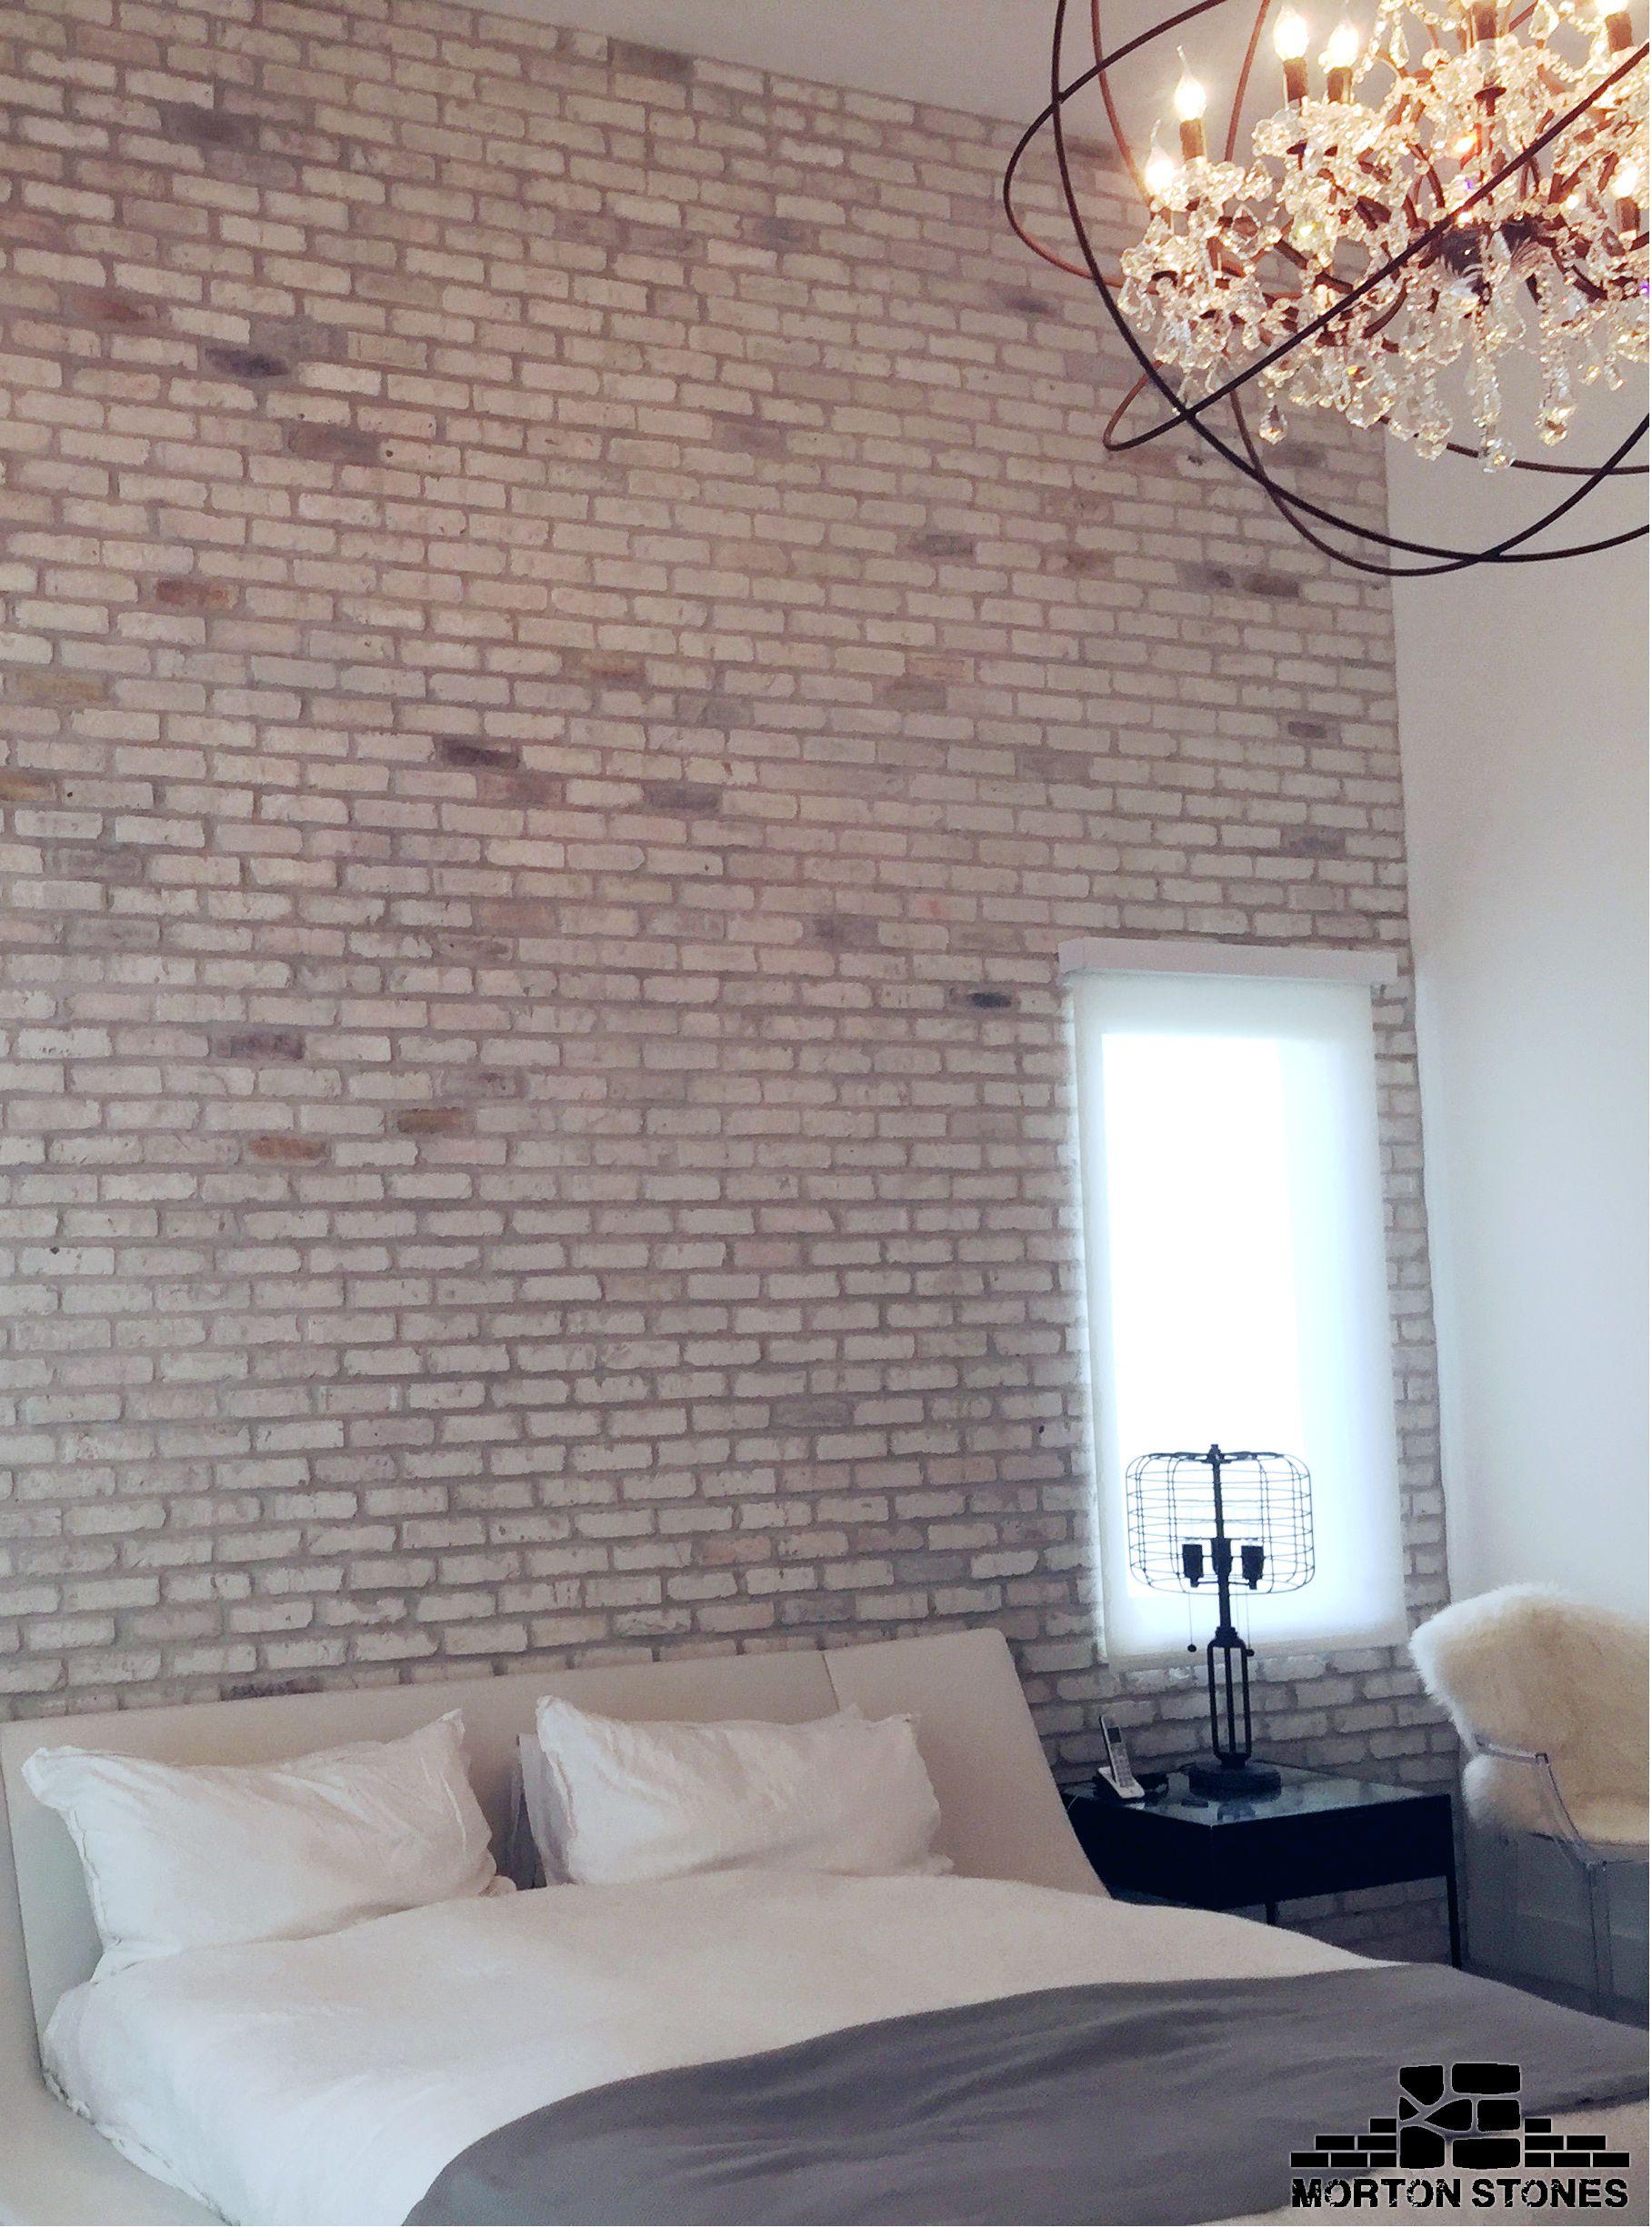 A warm and cozy bedroom design idea mortonstones brick tiles